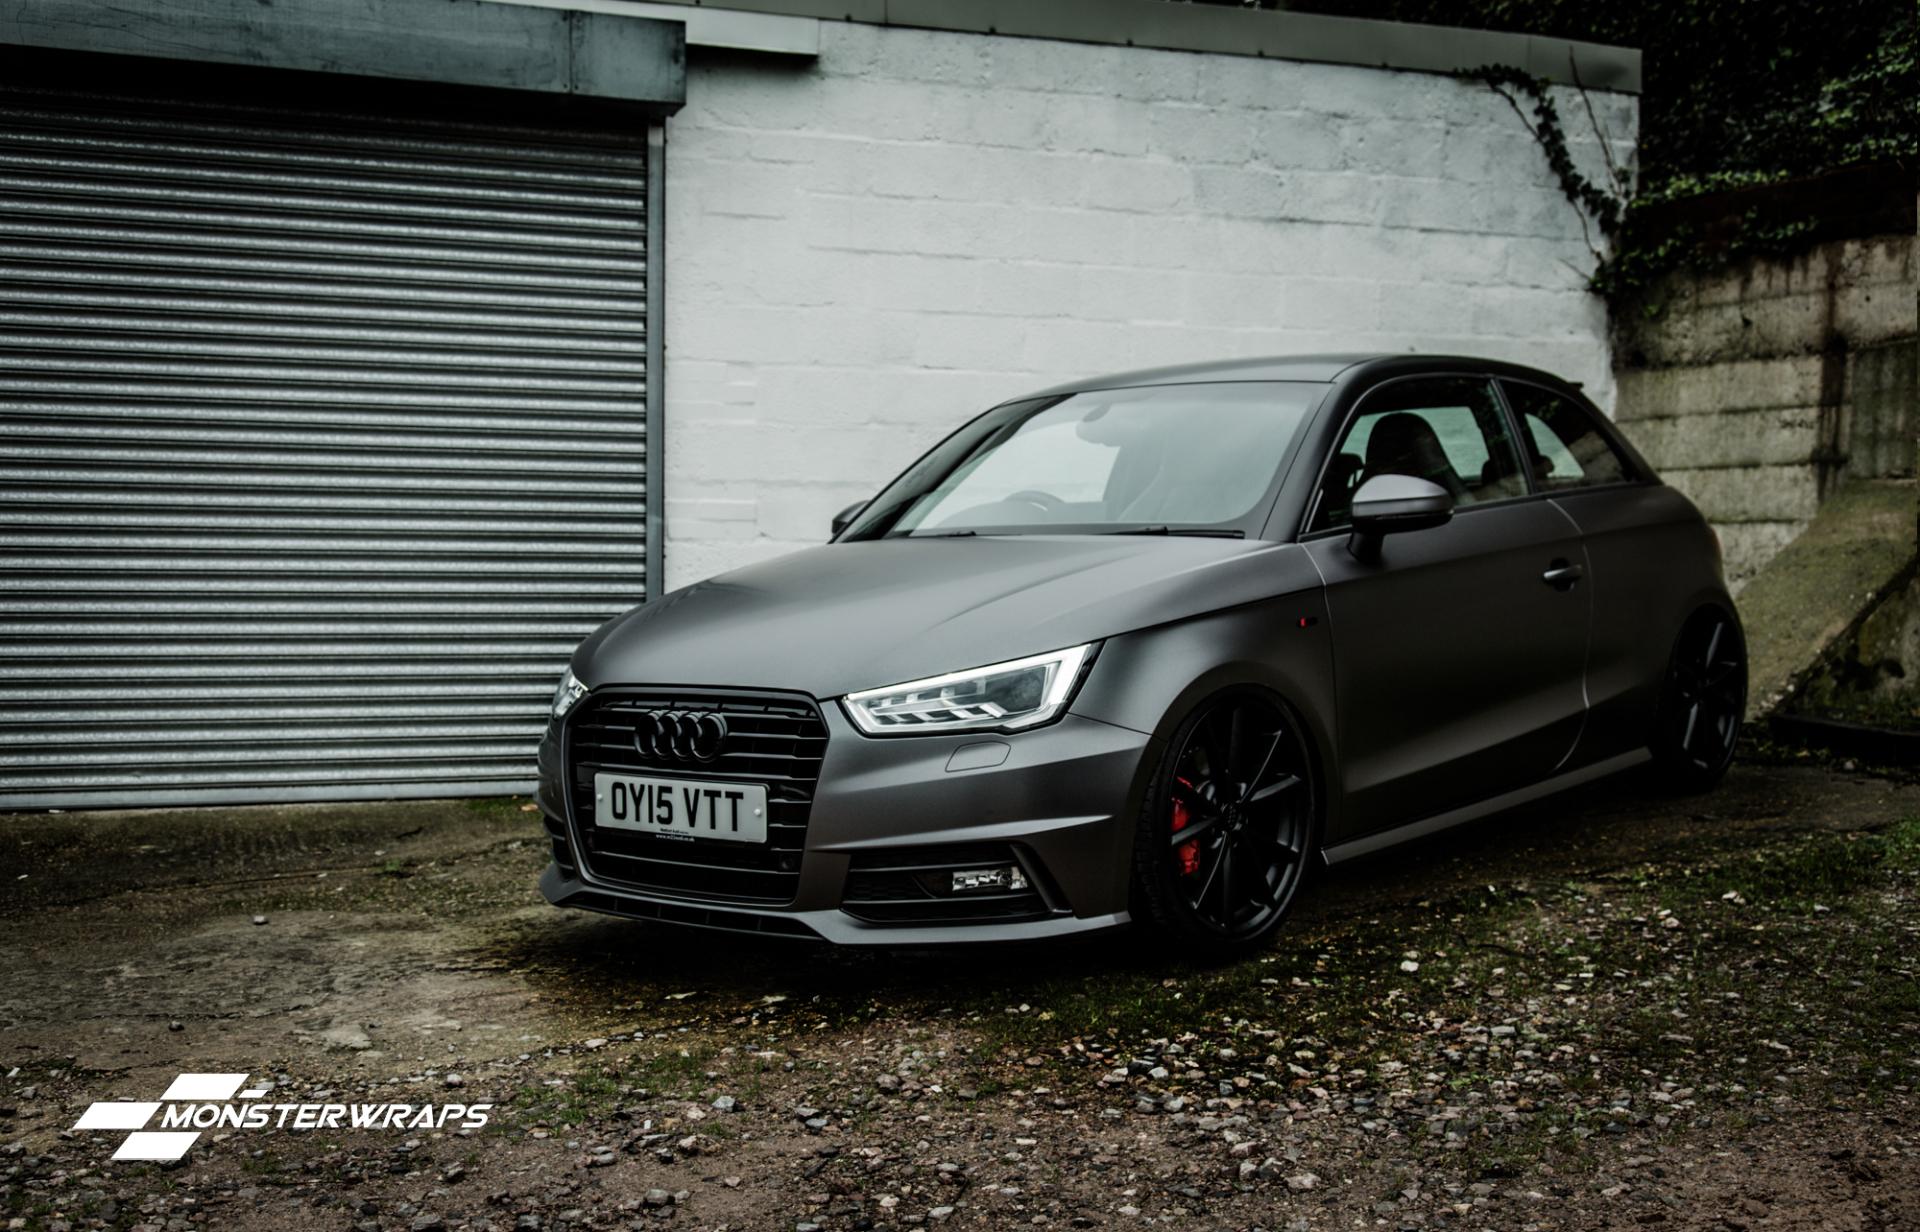 Audi A1 Tsfi Satin Dark Grey And Satin Black Full Wrap